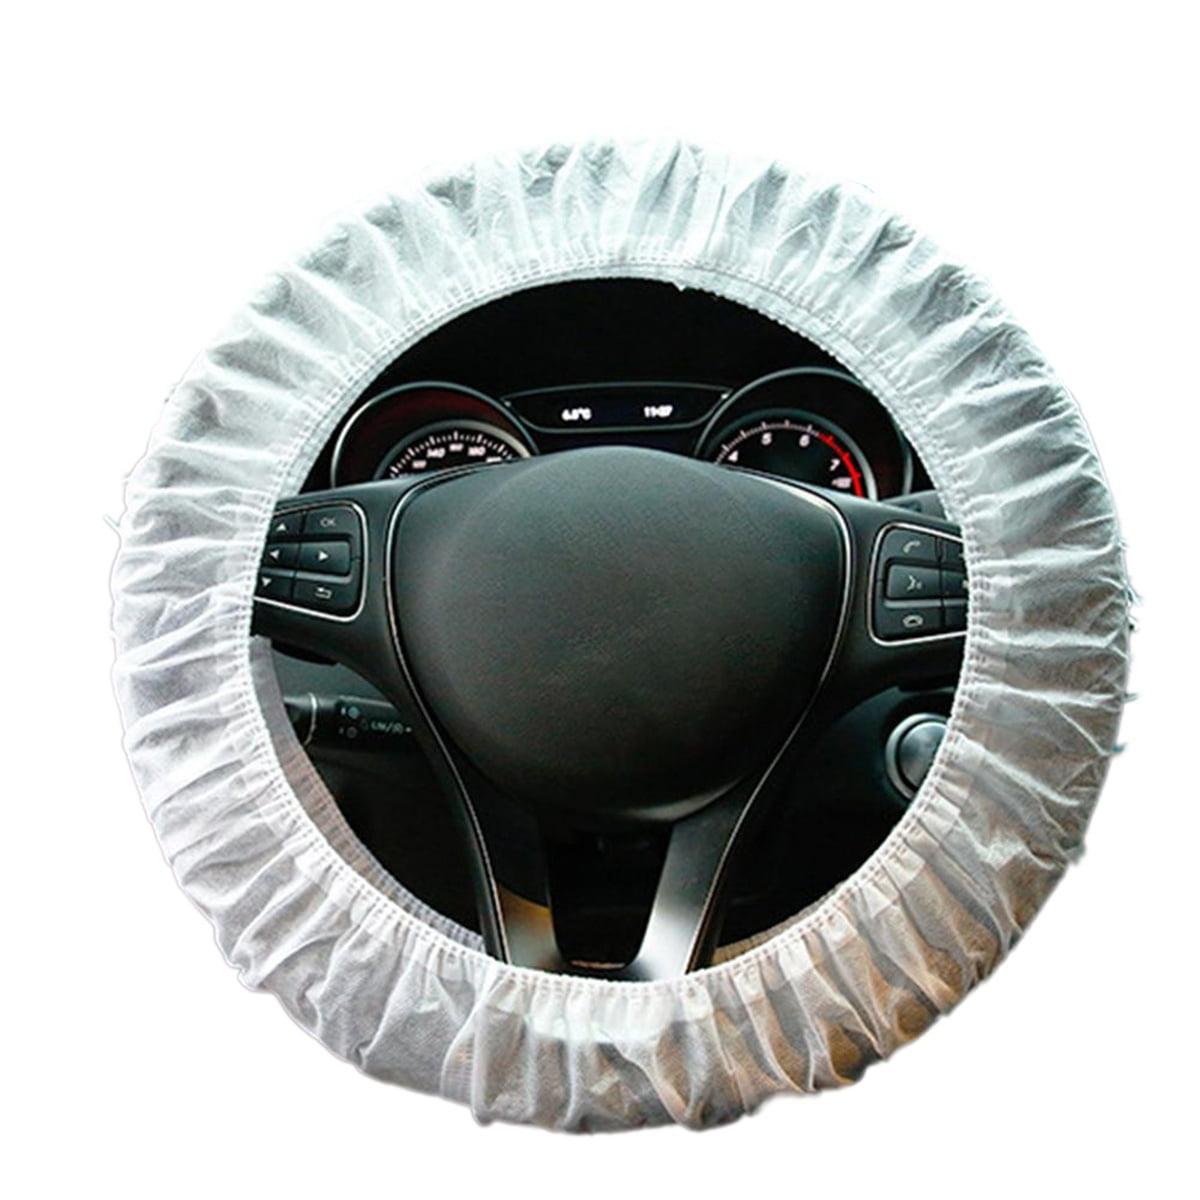 100 Pcs Disposable Steering Wheel Cover Plastic Dustproof Universal Car Steering Wheel Cover